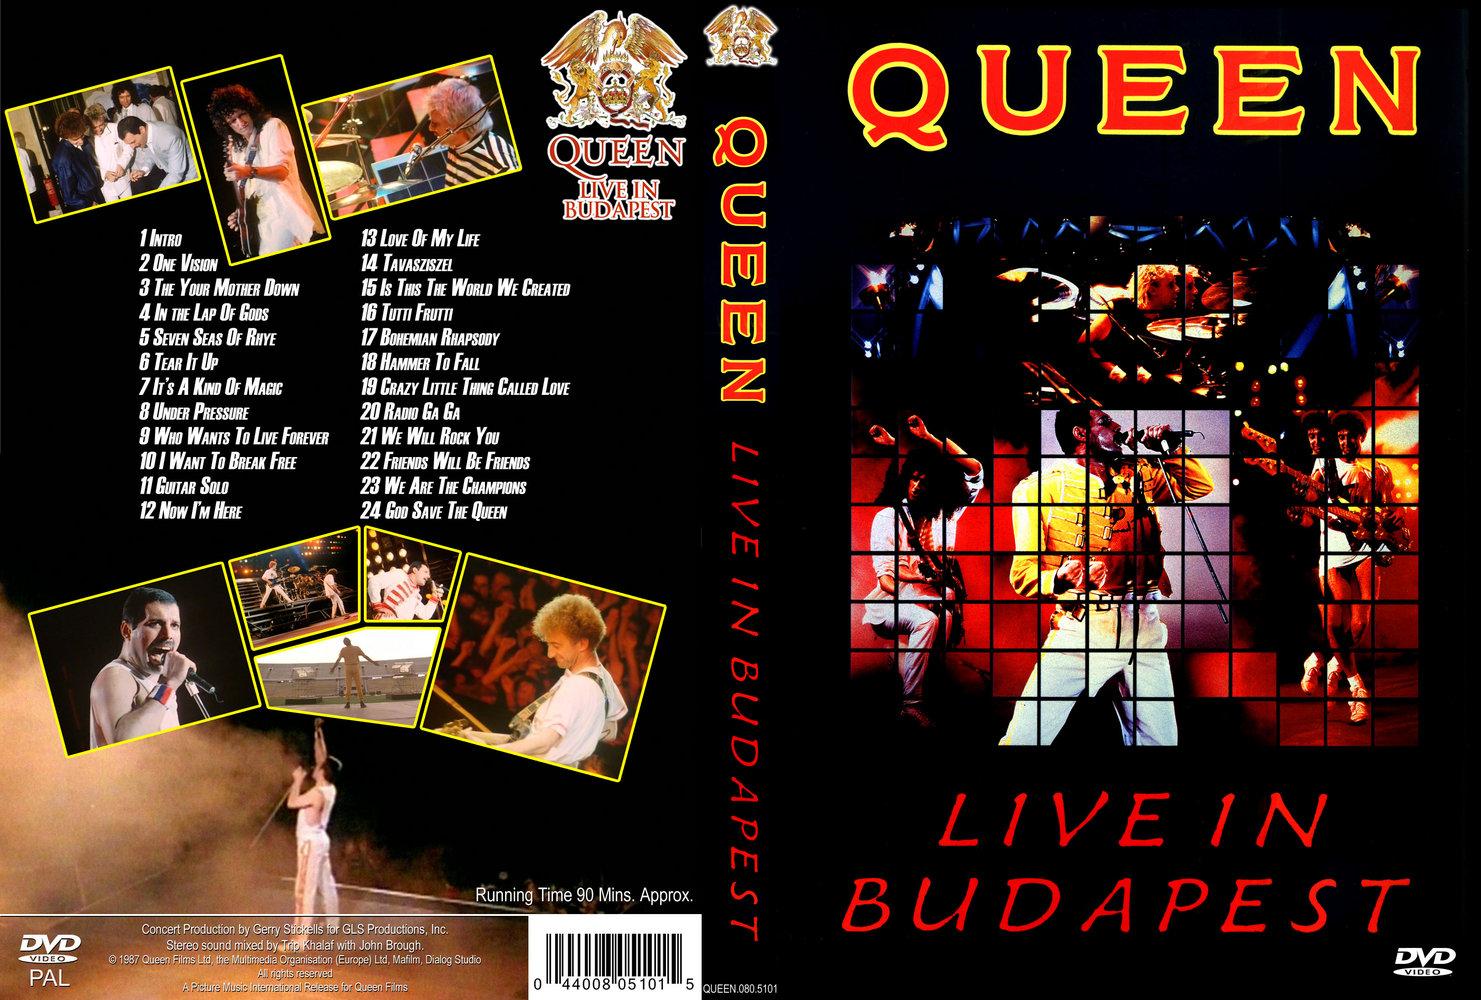 Conciertos completos de Queen [Youtube] - Taringa!